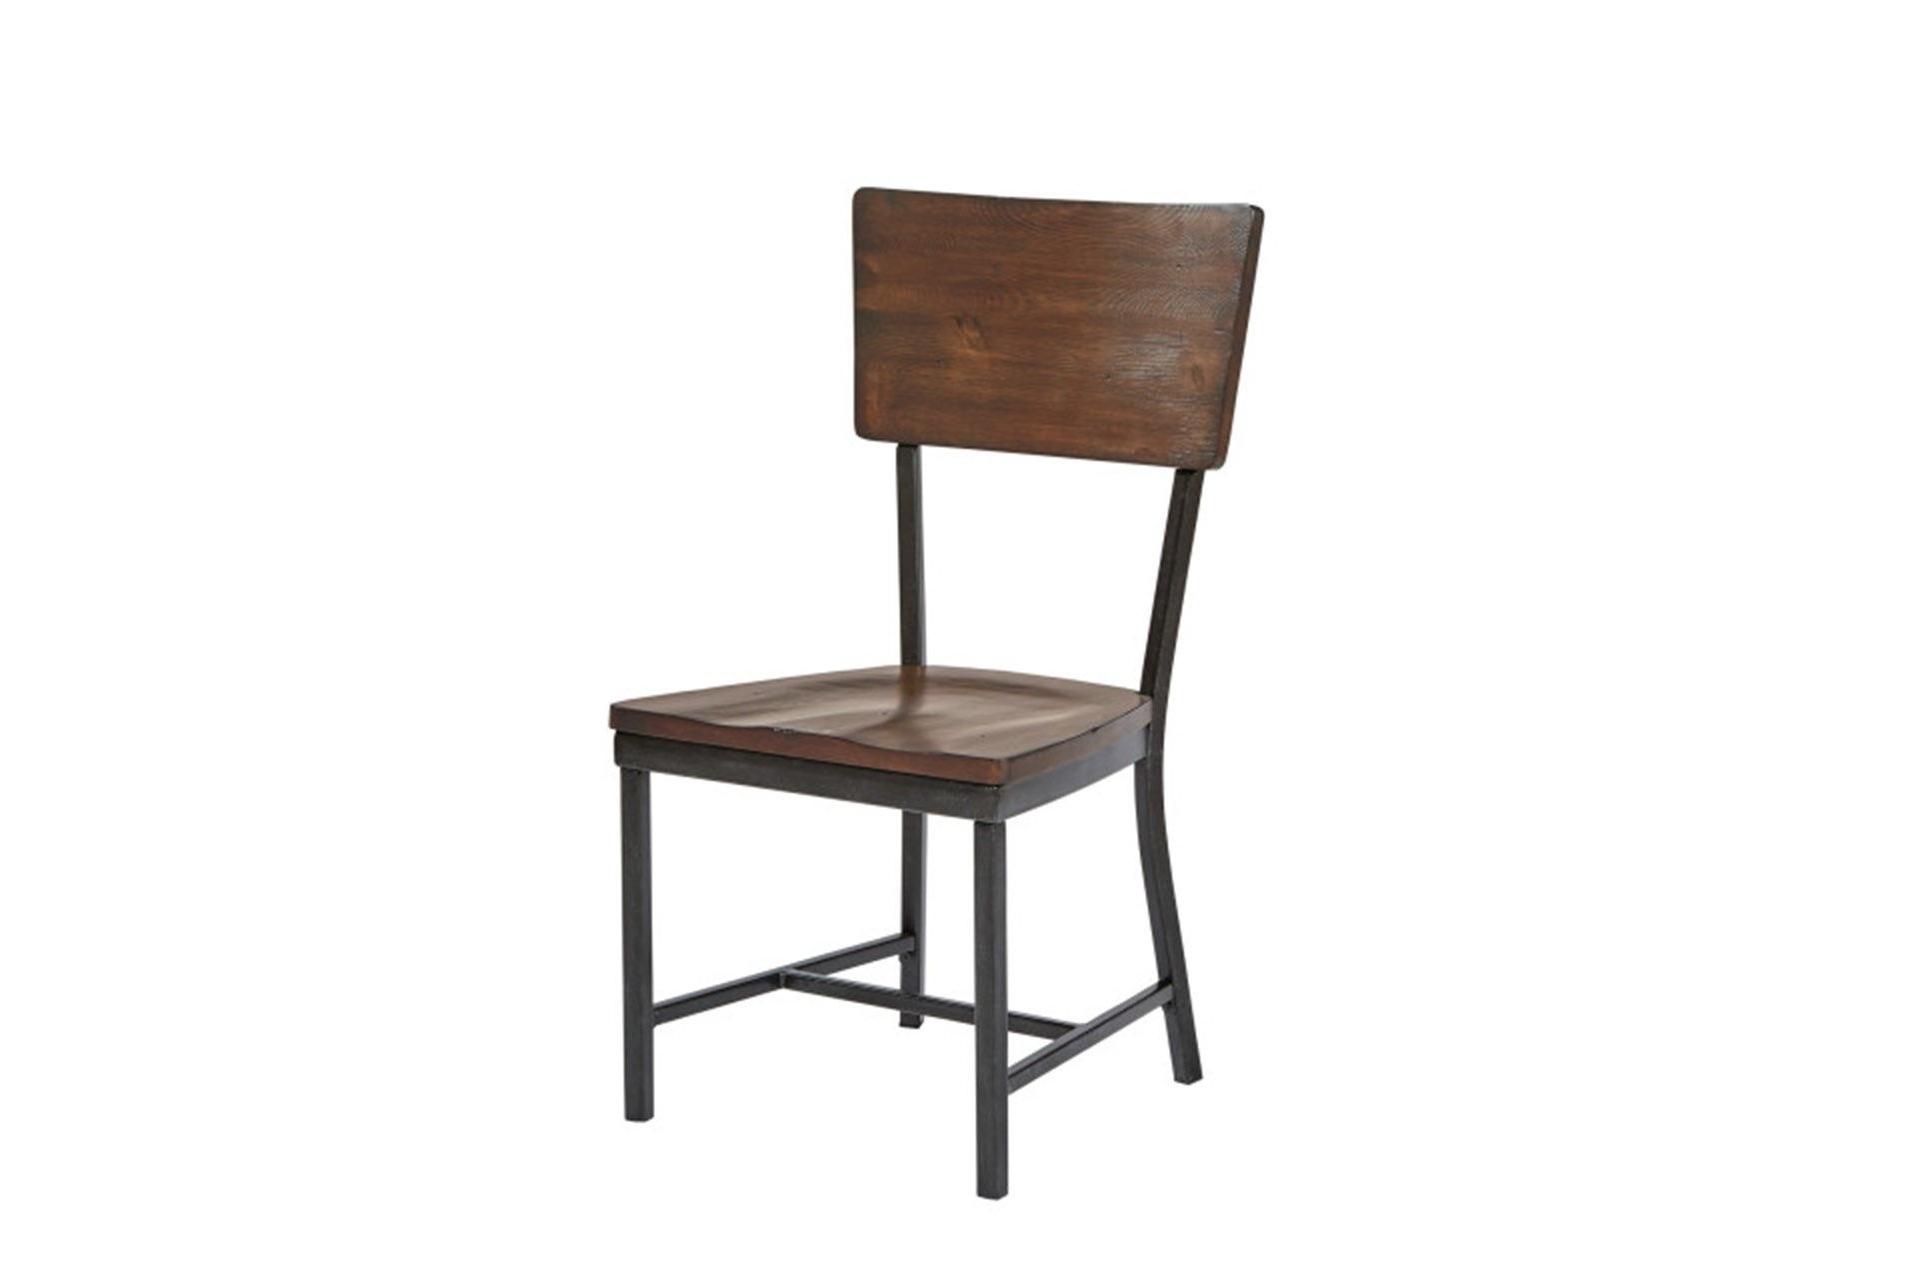 Current Marie Murphy ( Mm5la ) Pinterest Profile Statistics For Durango Smoke & Warm Cedar Dining Chairs (View 18 of 20)